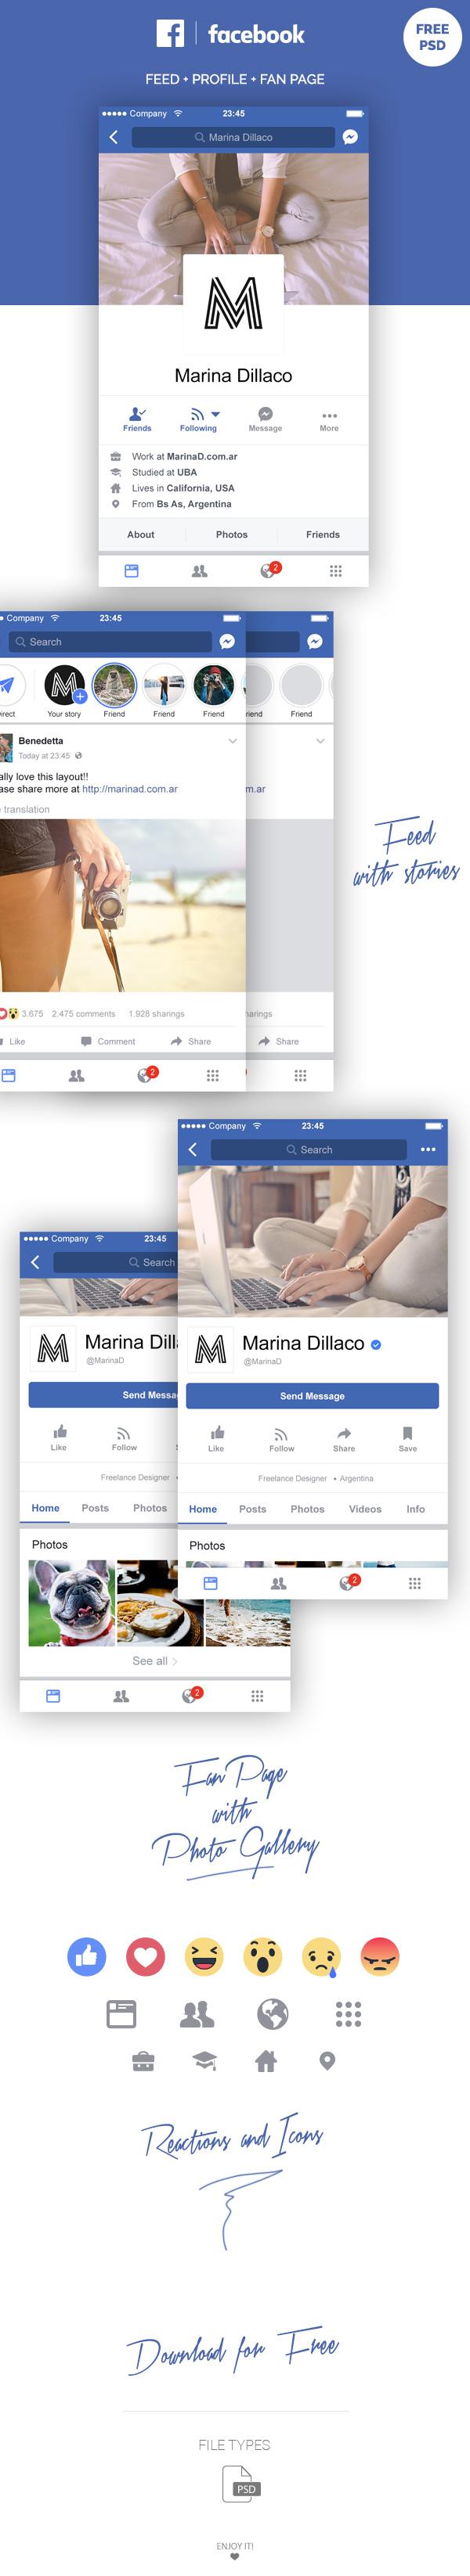 facebook mobile ui psd download